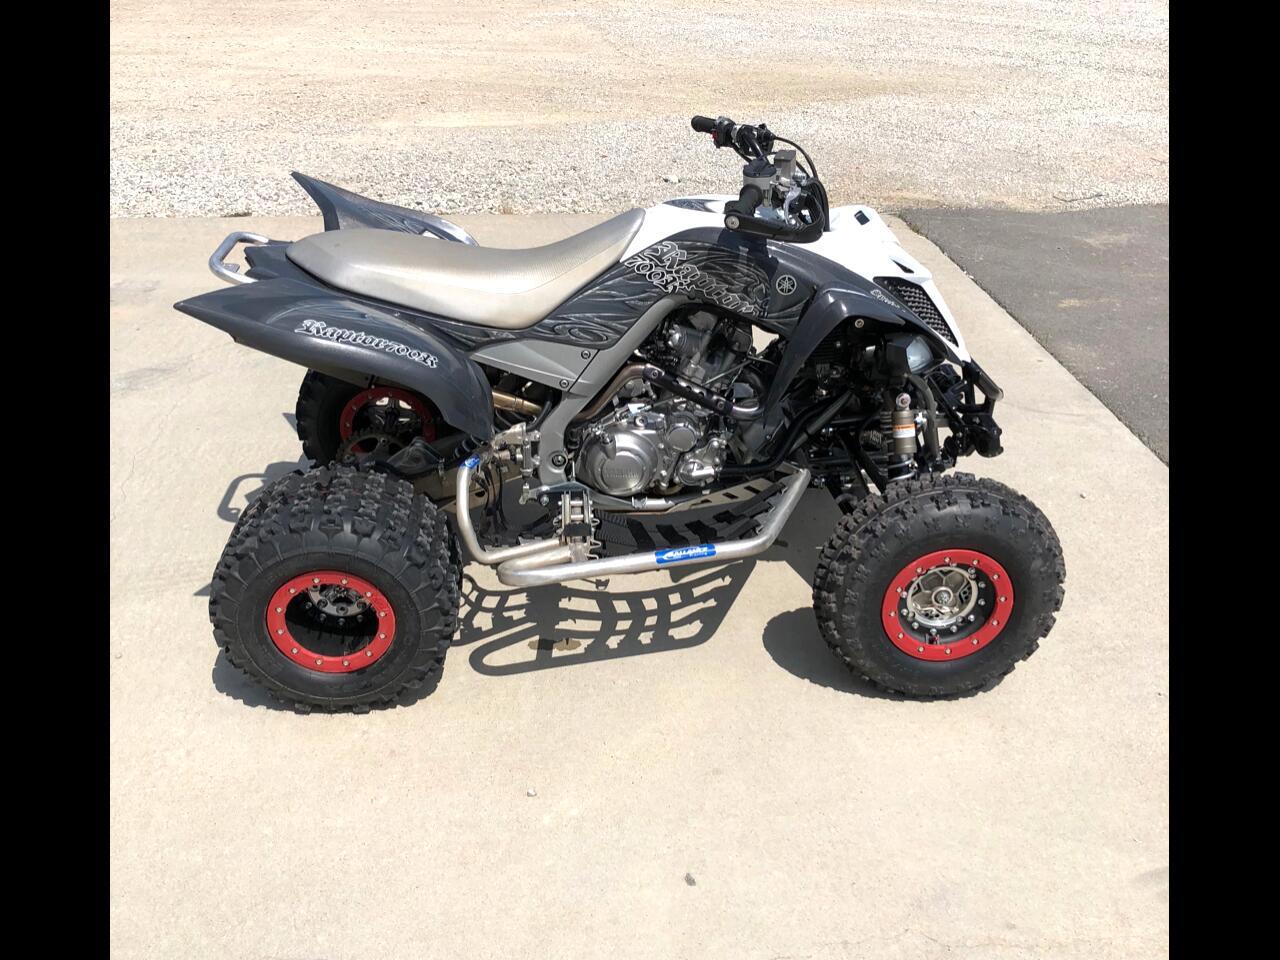 2014 Yamaha Raptor 700 R SE